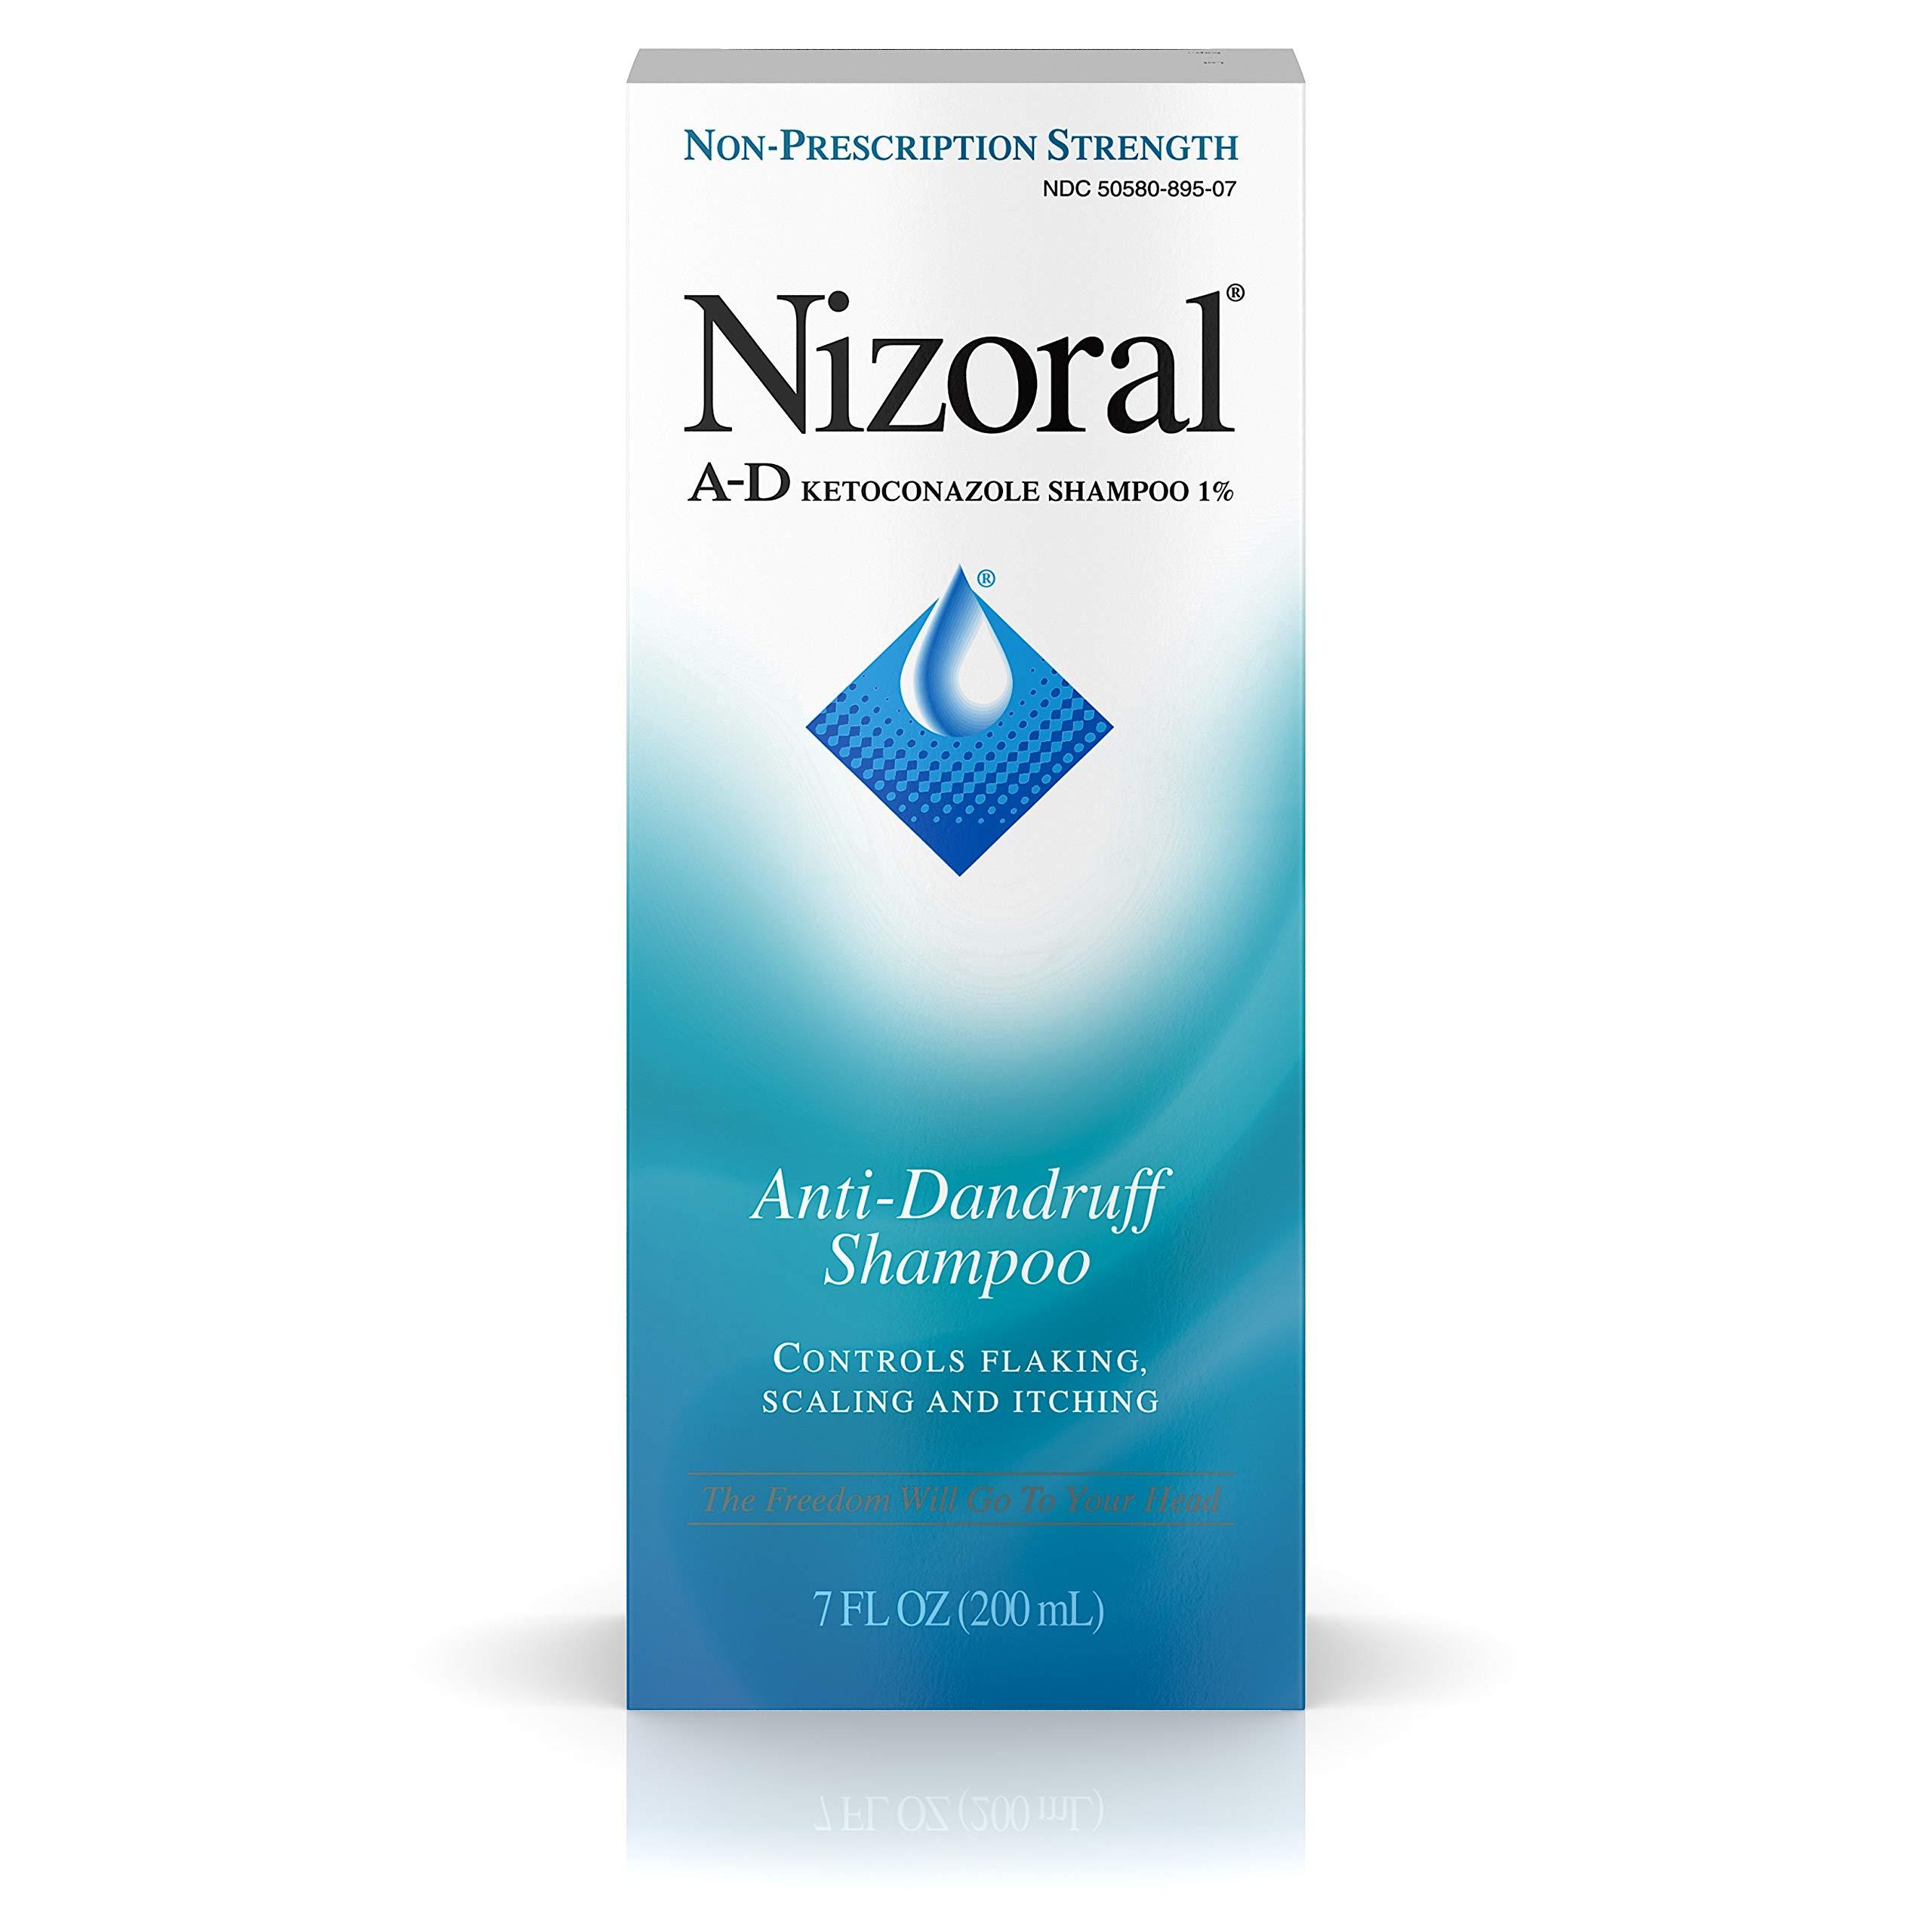 Nizoral A-D Anti-Dandruff Shampoo 7 Fl. Oz Itchy Scalp Dandruff Treatment w/ Ketoconazole 1%